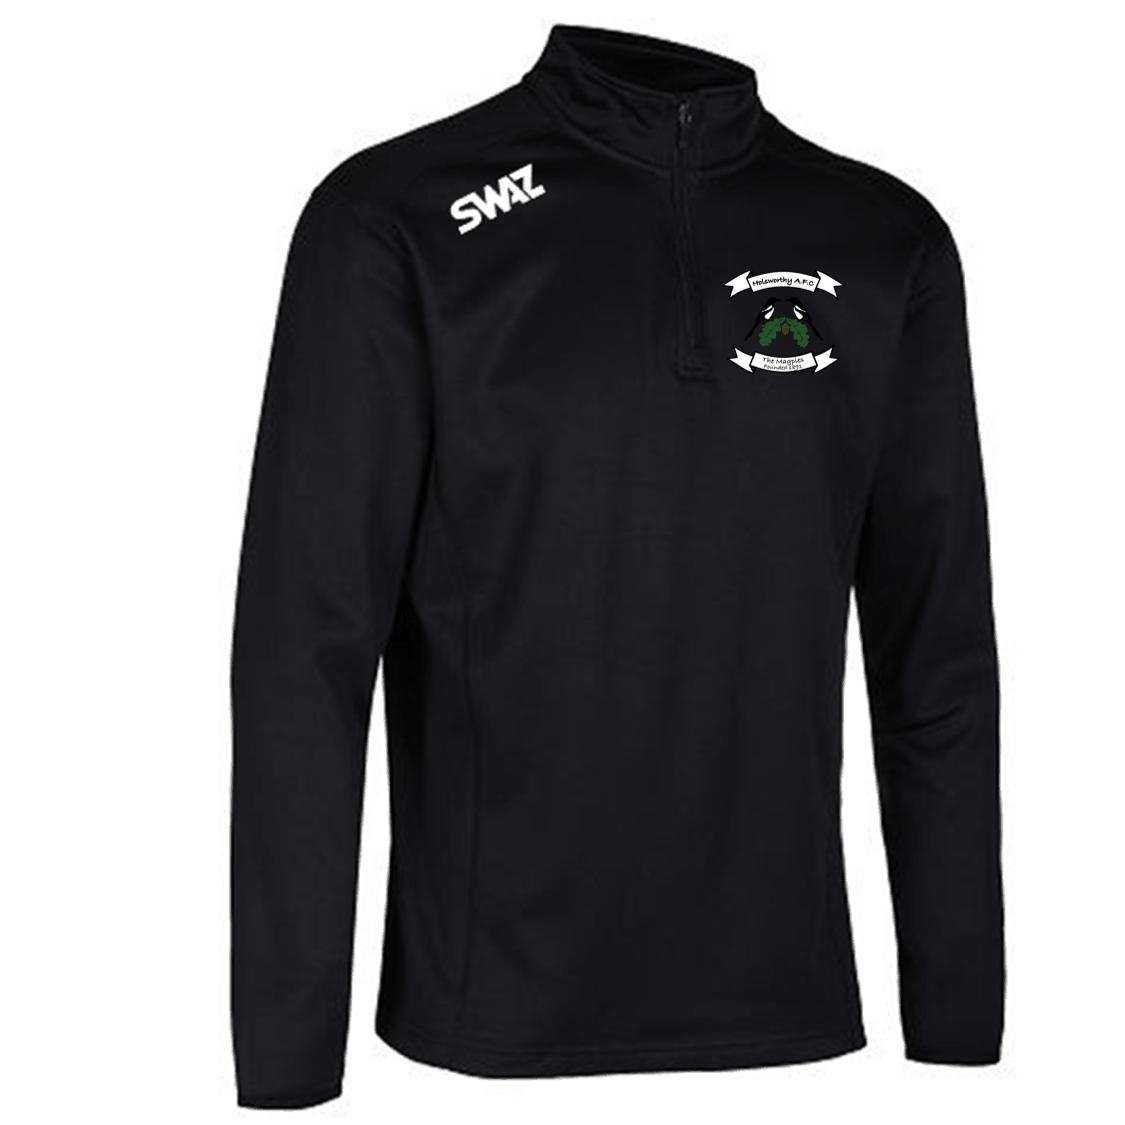 Holsworthy AFC Midlayer | SWAZ Teamwear | Football Kit Supplier